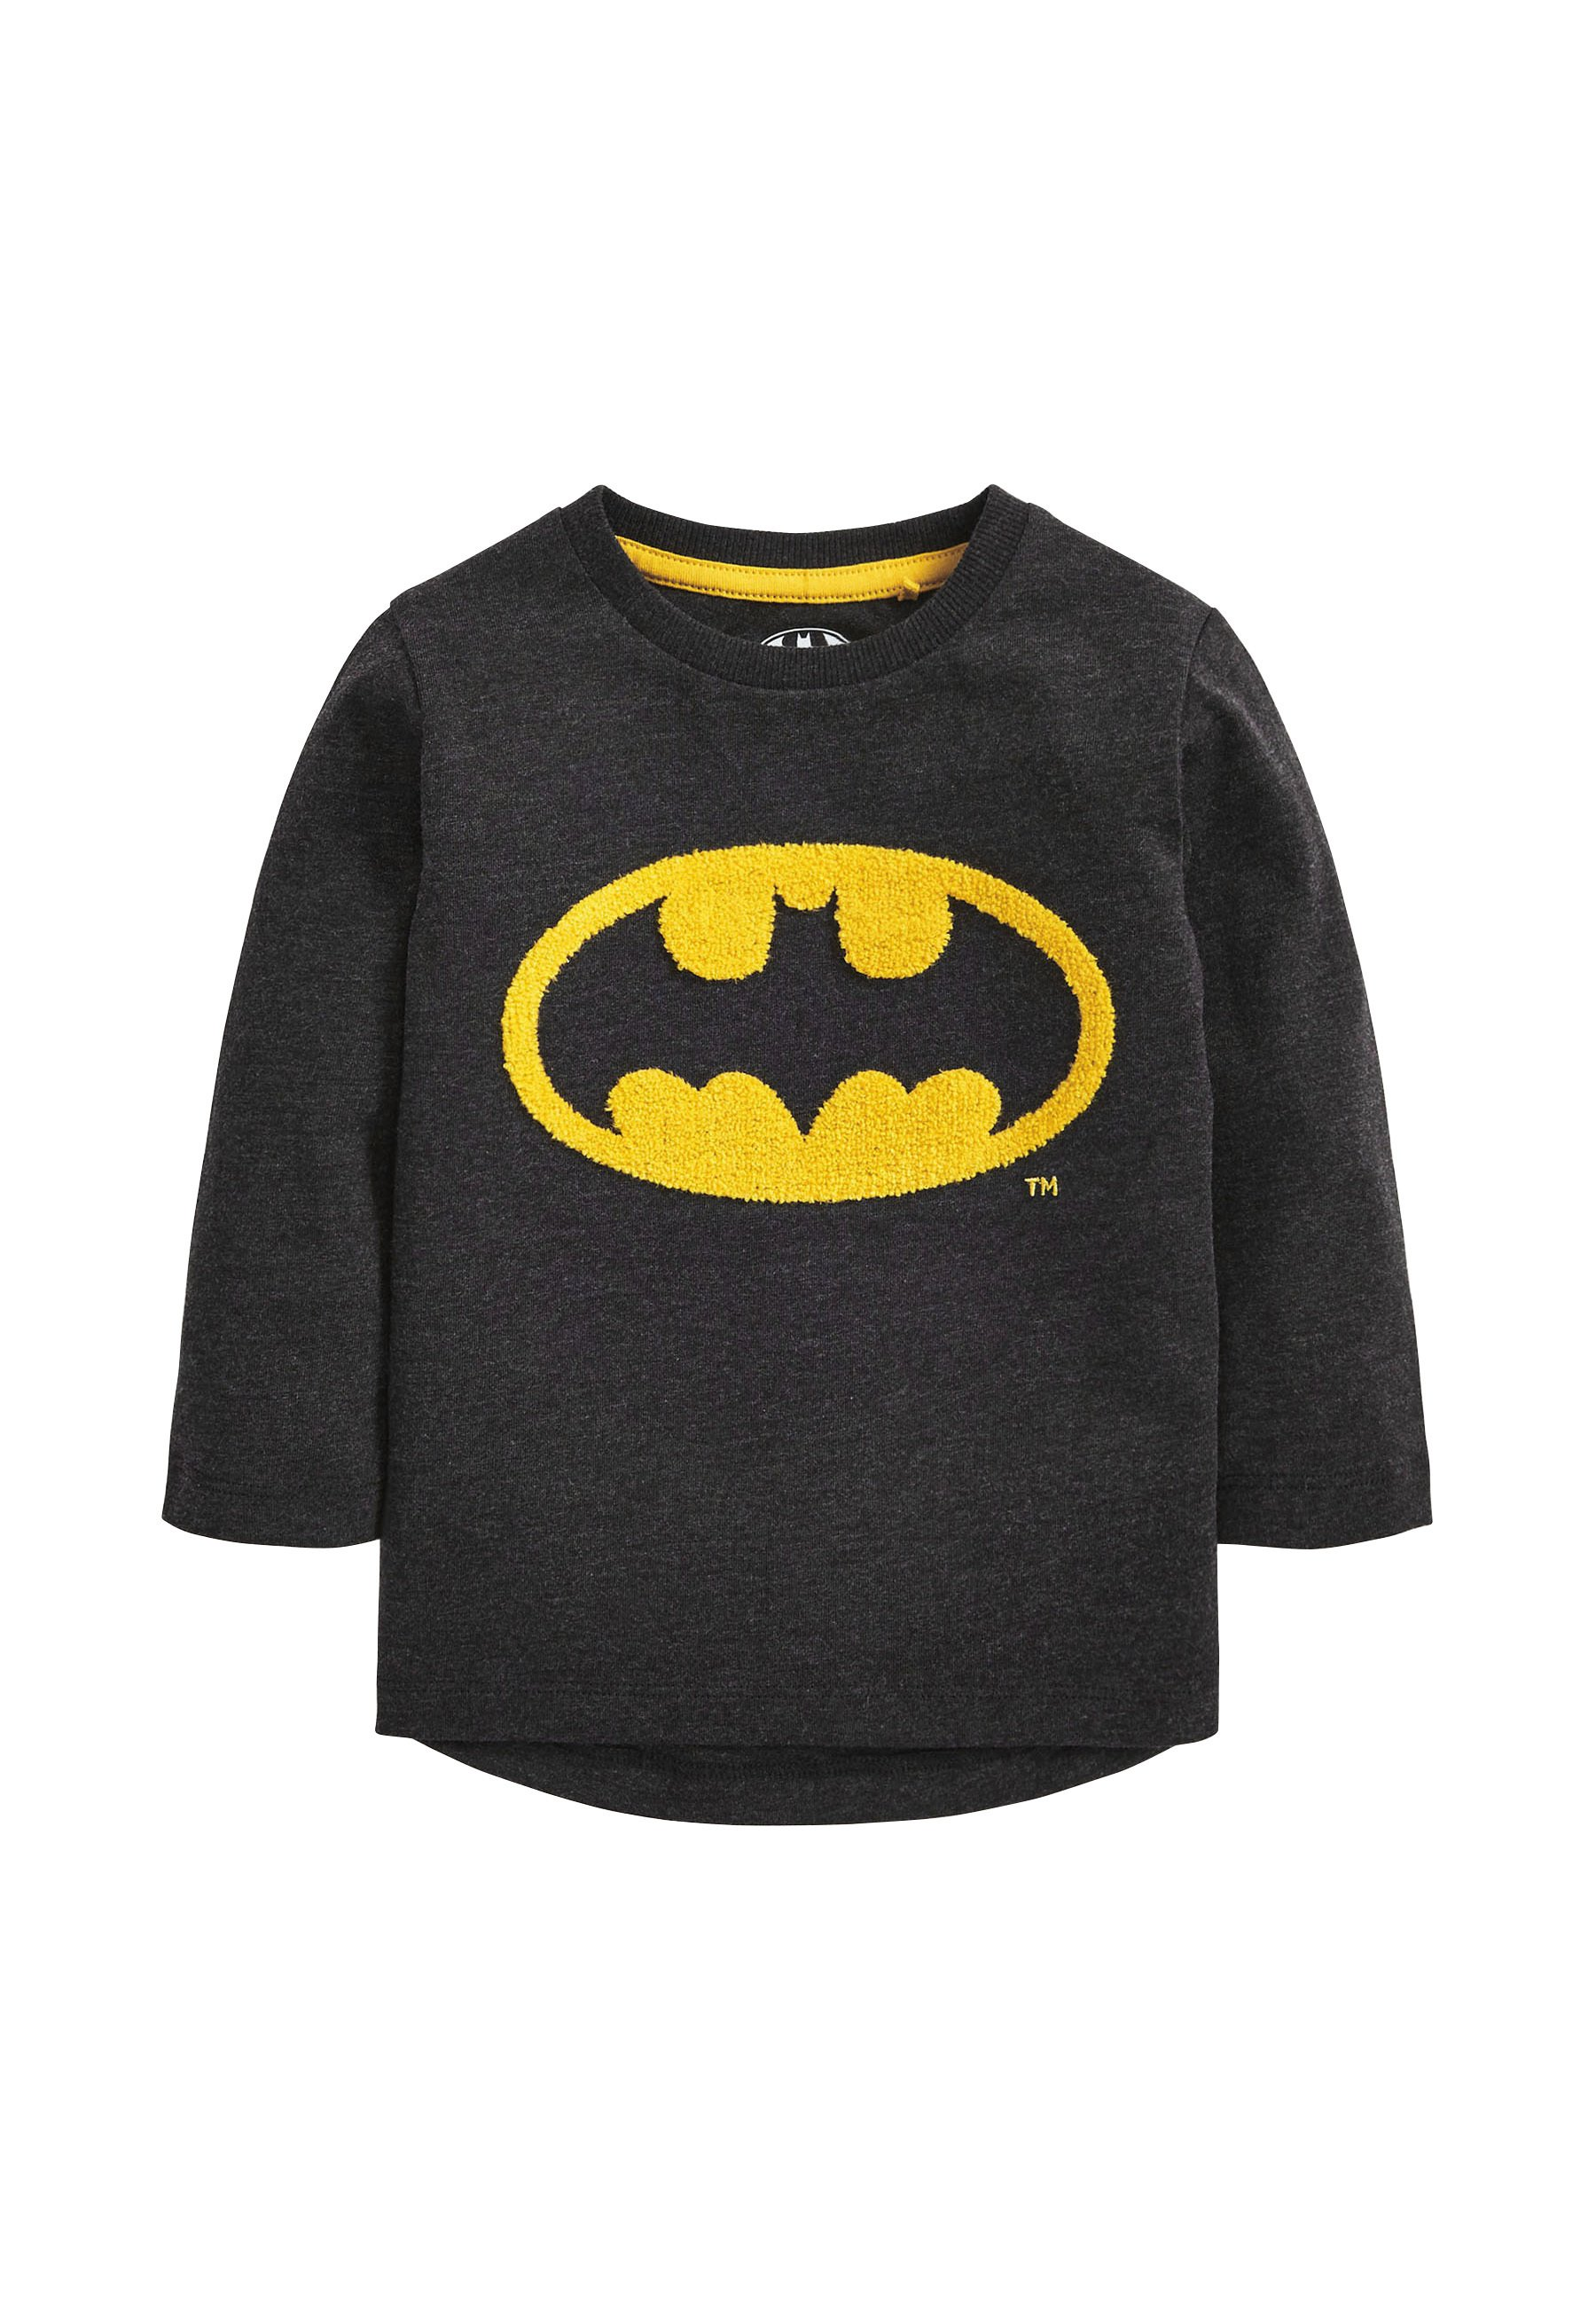 Kinder BATMAN LOGO JERSEY LONG SLEEVE T-SHIRT - Langarmshirt